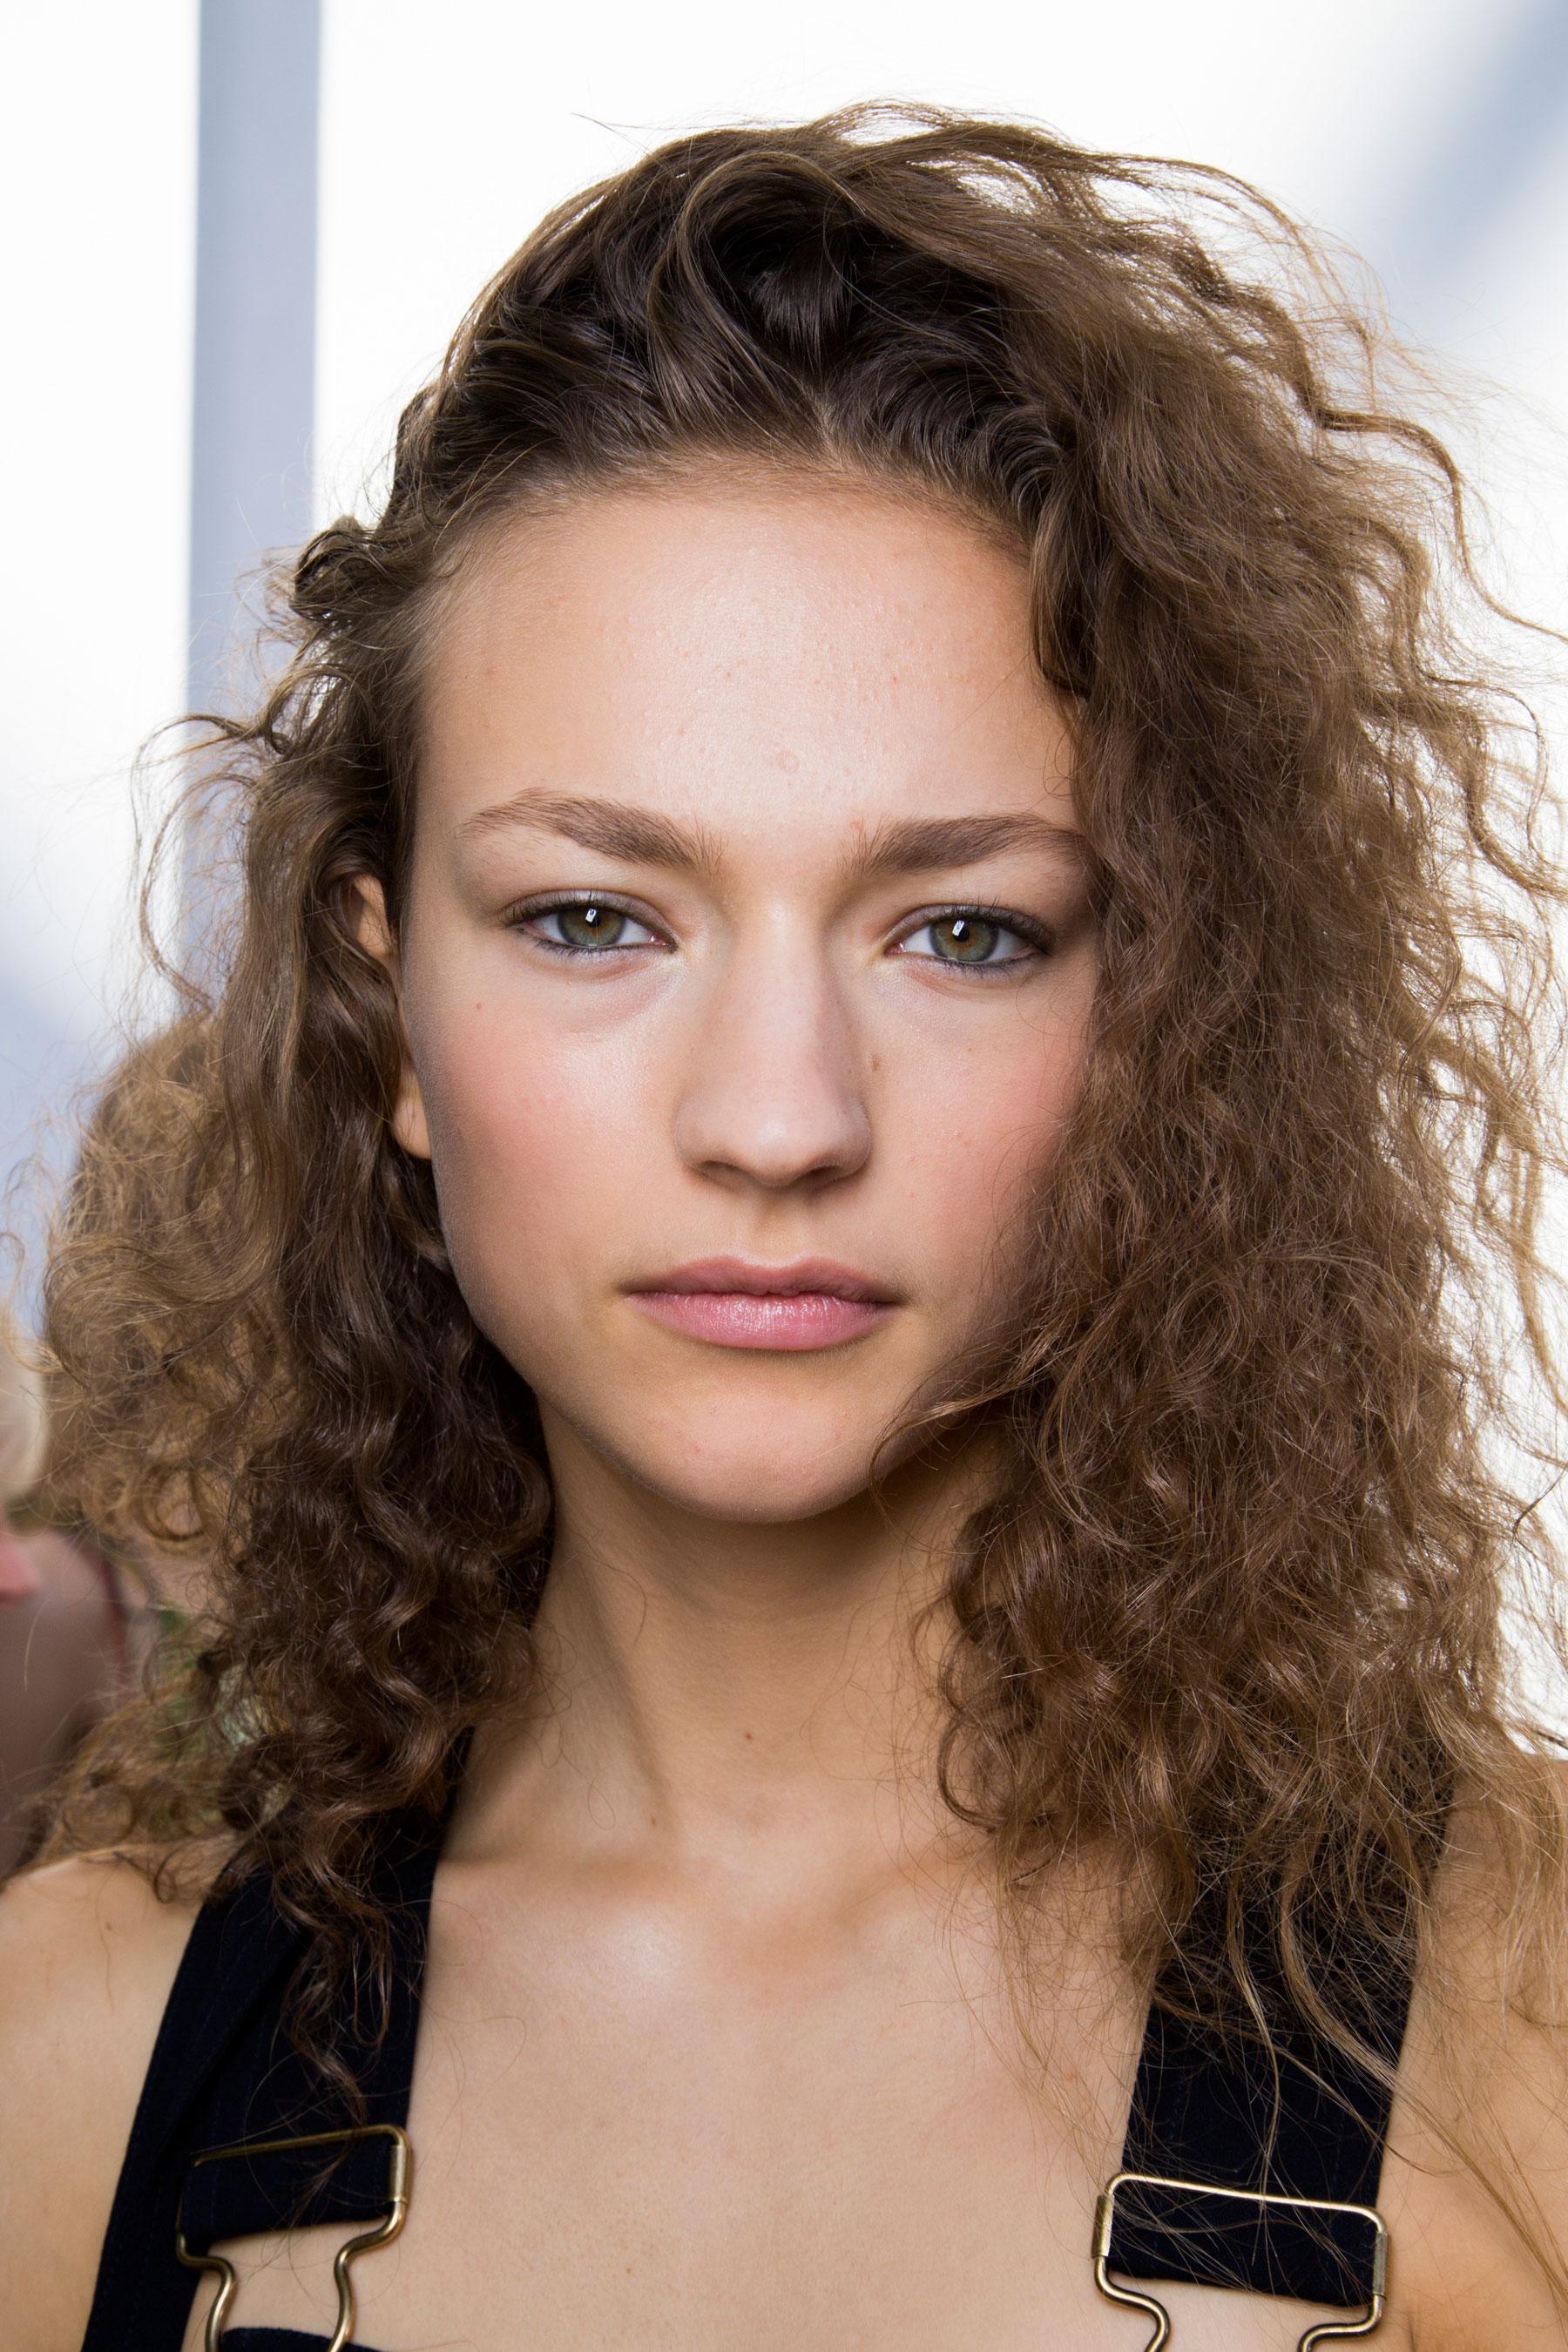 Chloe-spring-2016-beauty-fashion-show-the-impression-117